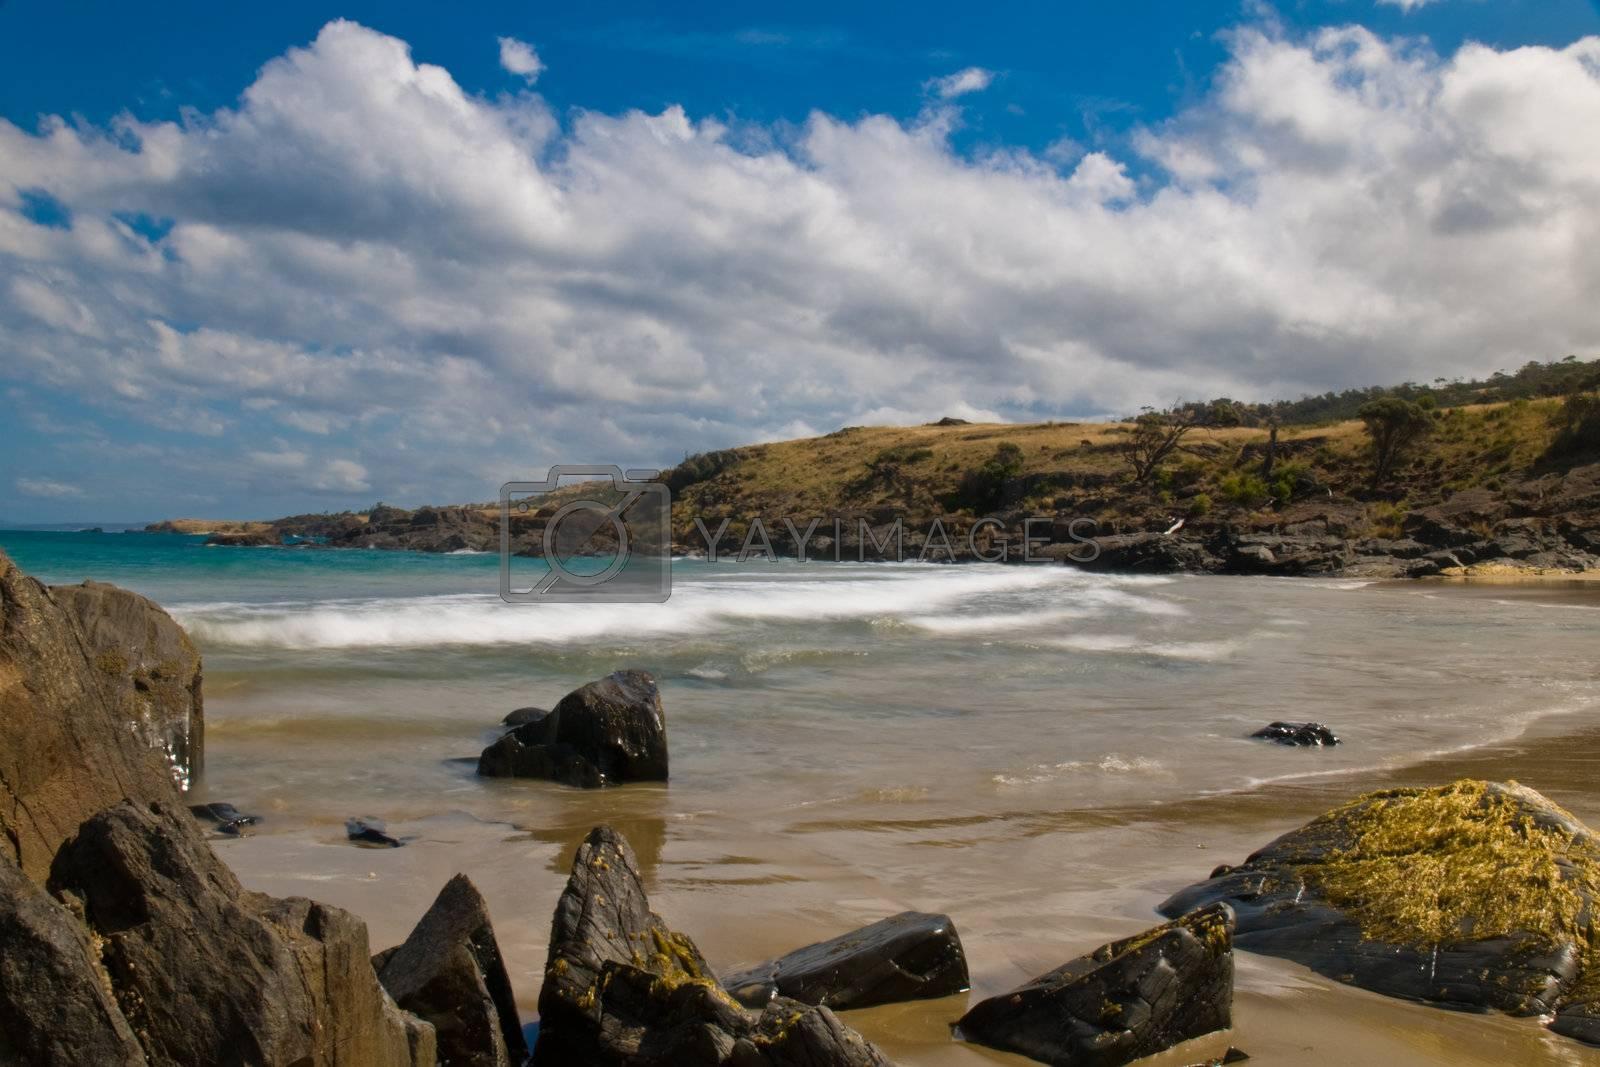 Sea landscape with bay, rock, beach, coastline, blue sky, long exposure, incoming waves